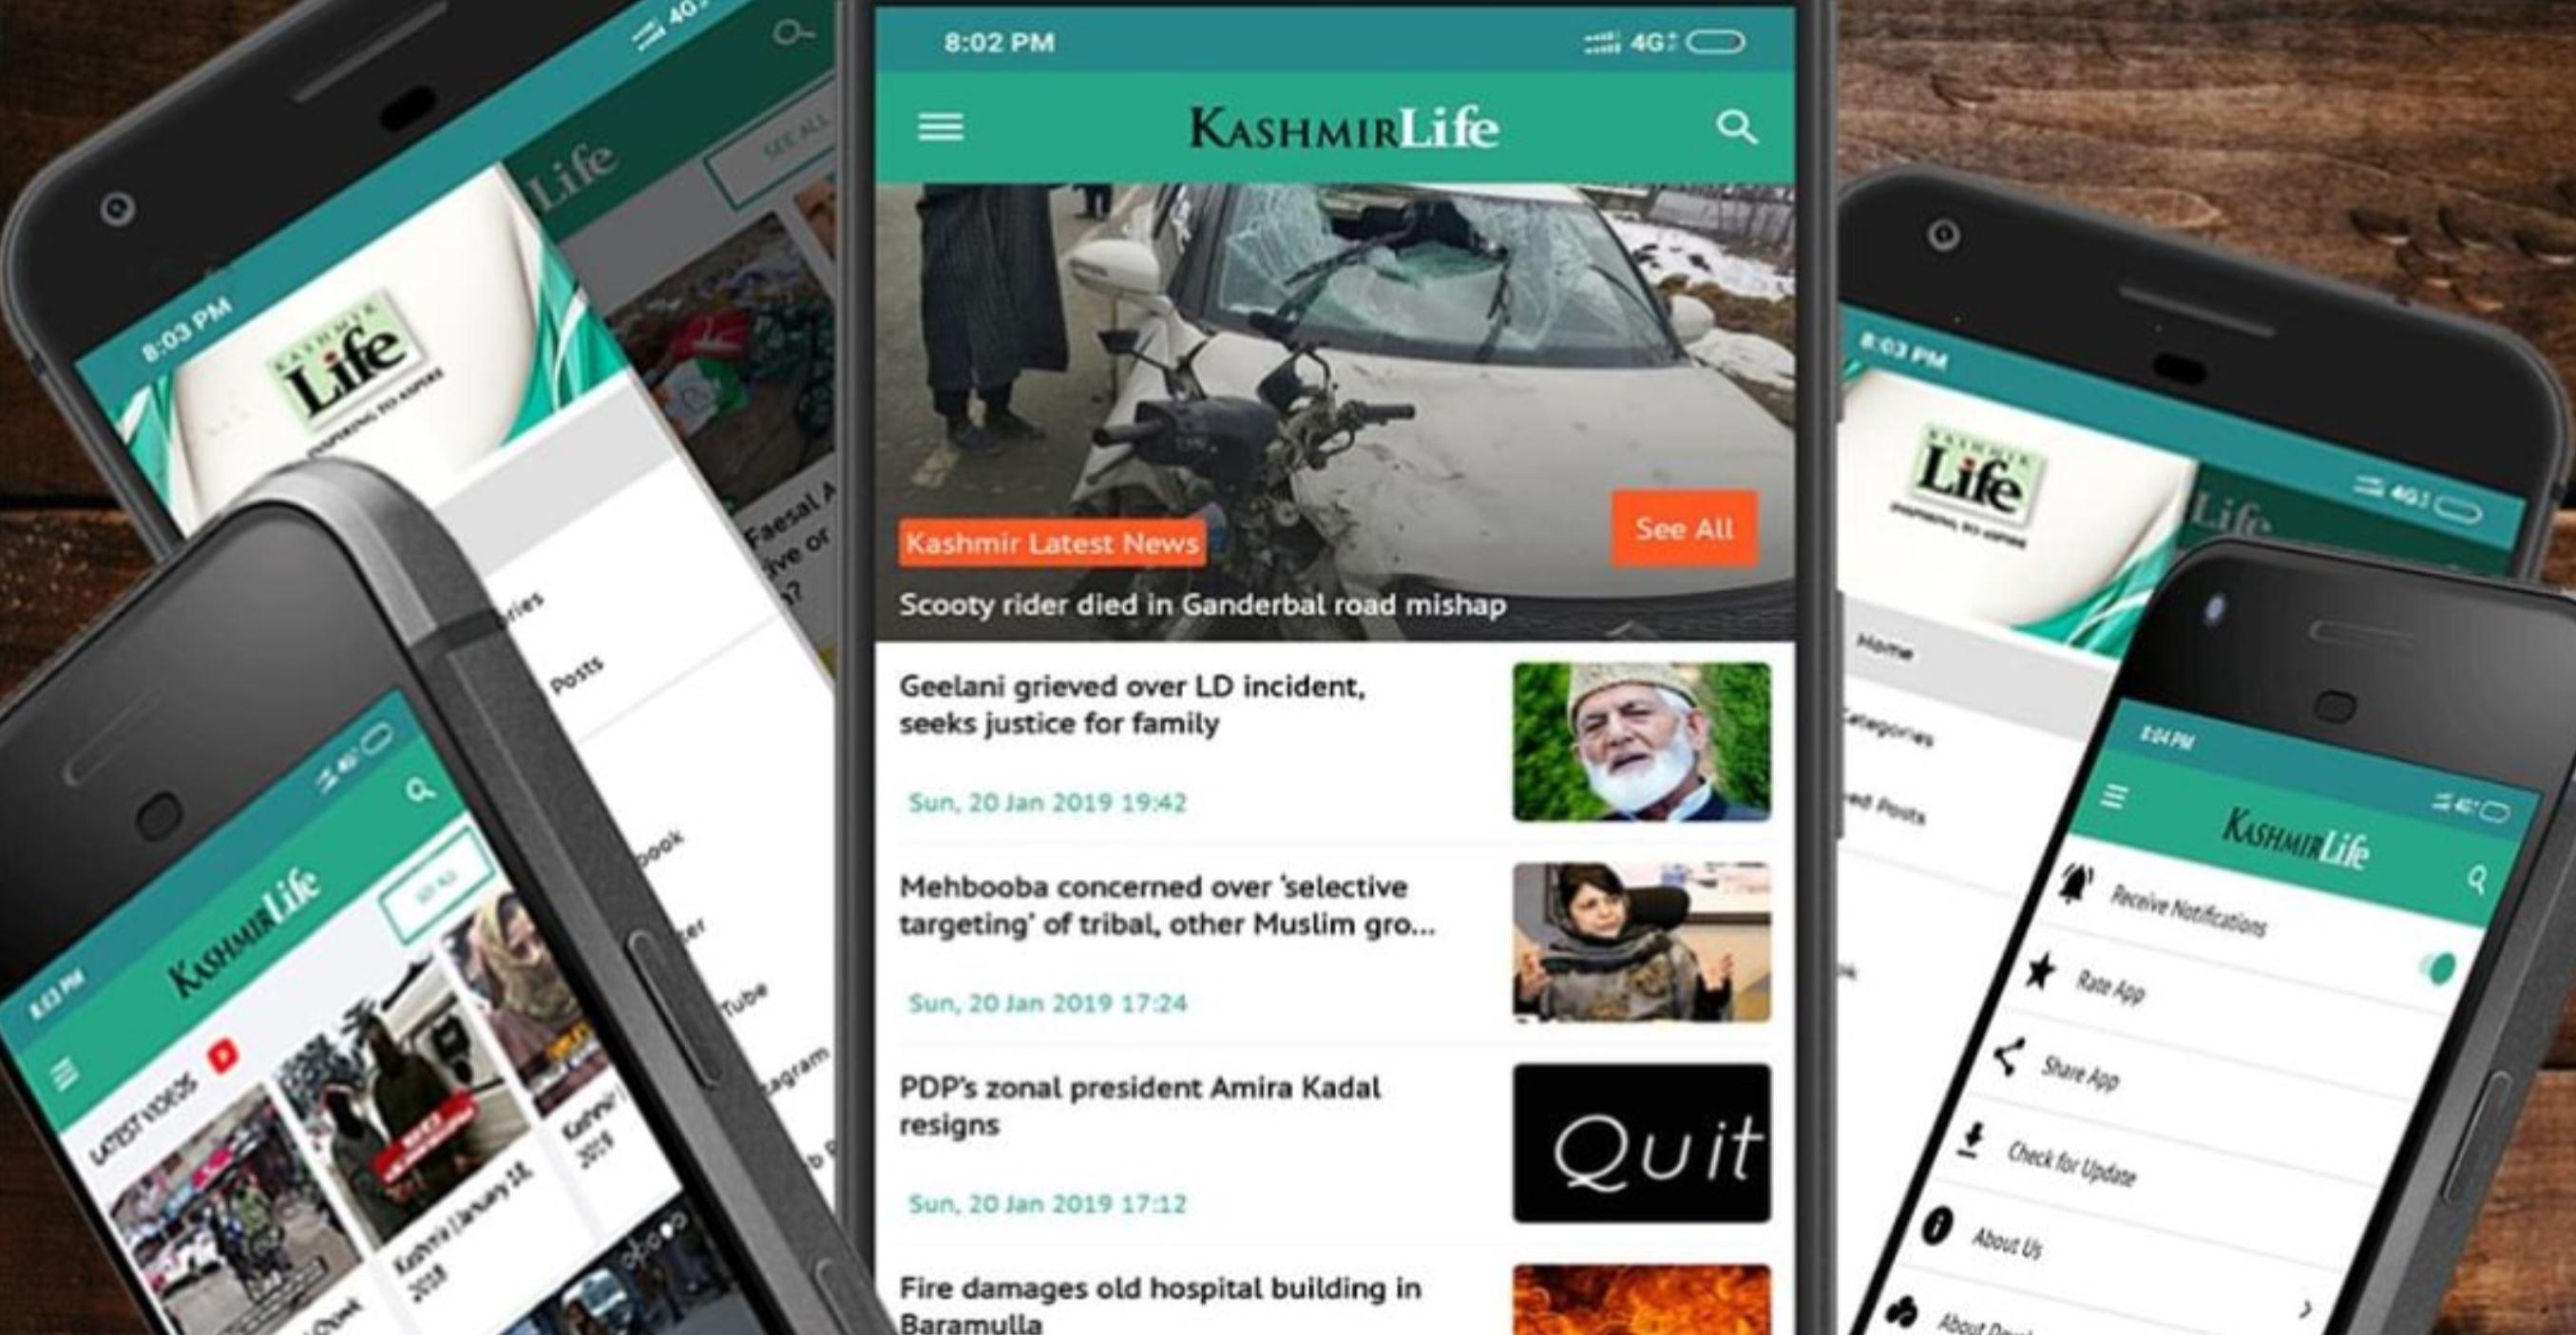 Kashmir Life Android App